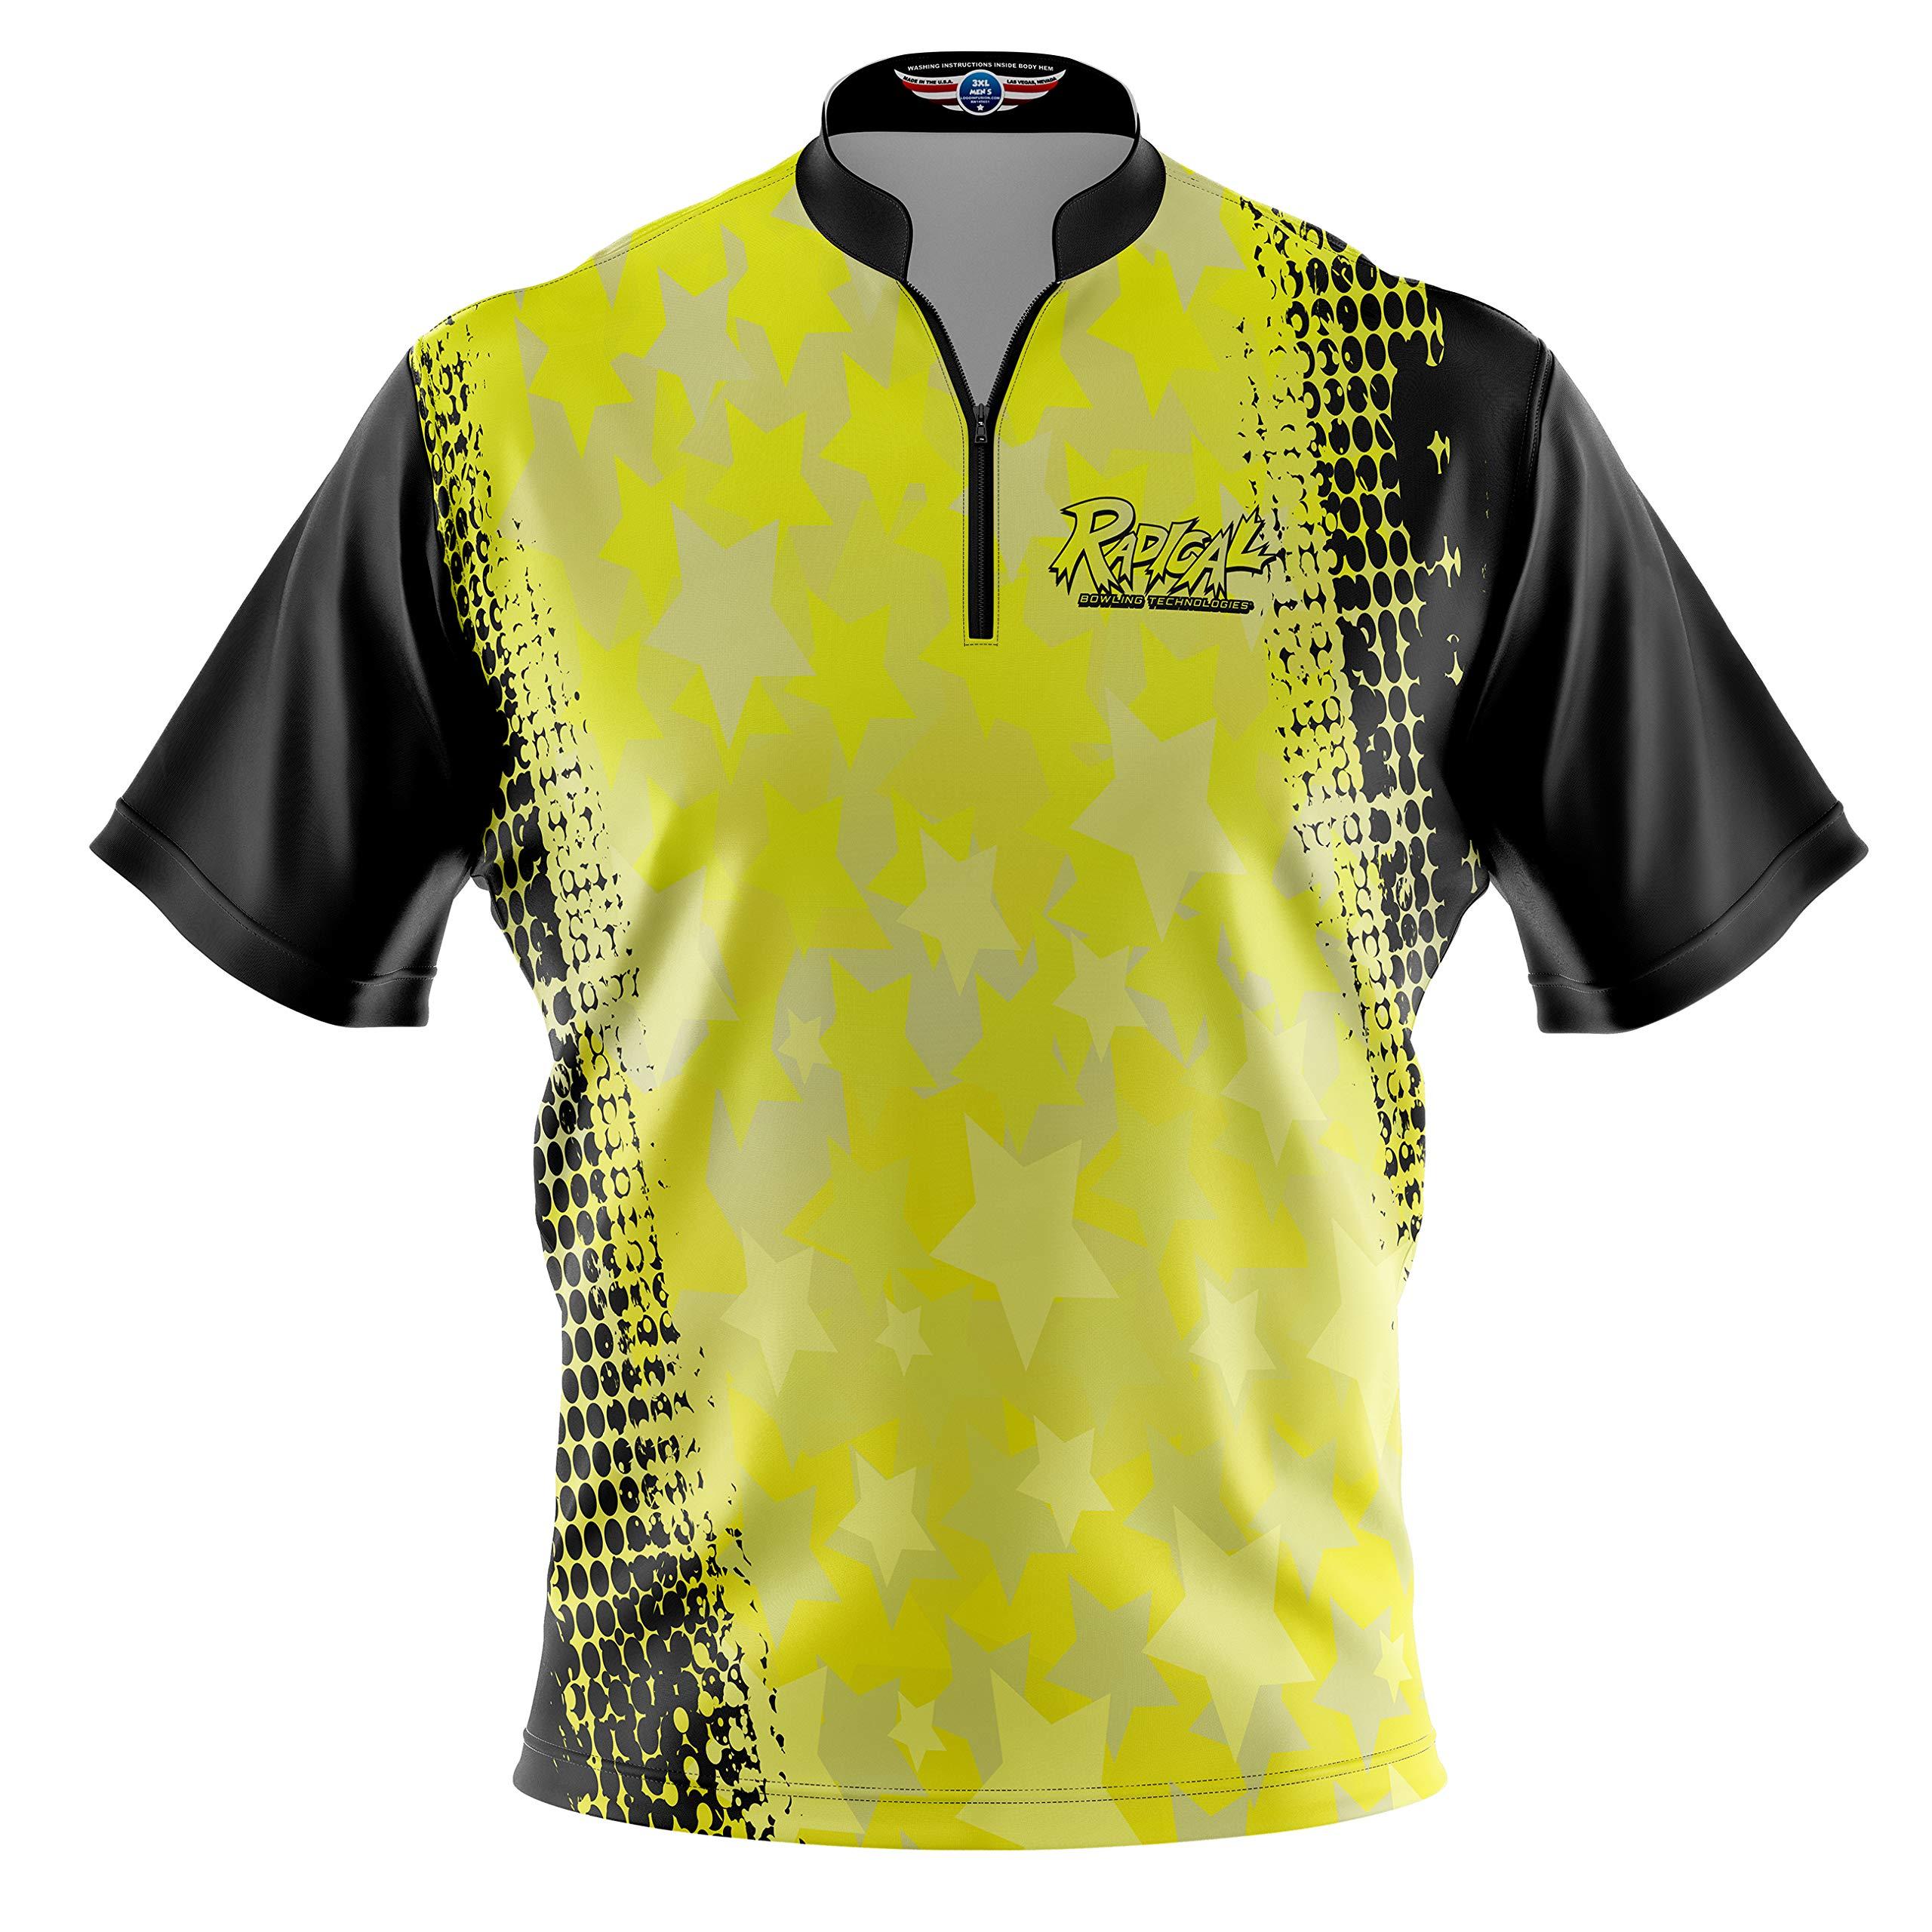 Logo Infusion Bowling Dye-Sublimated Jersey (Sash Collar) - Radical Style 0338 - Sizes S-3XL (3XL)